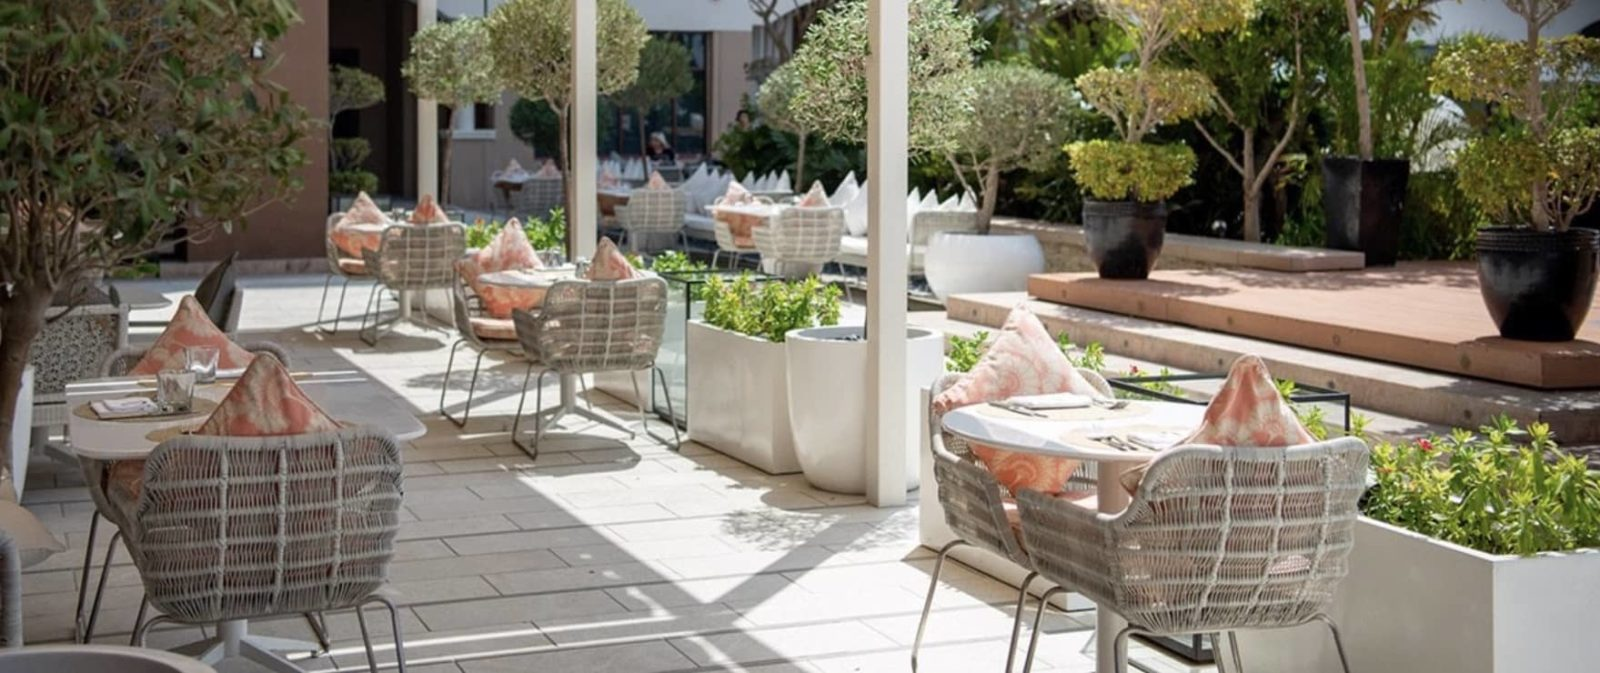 Restaurant Olea Kempinski Hotel Mall of The Emirates Terrace, фото